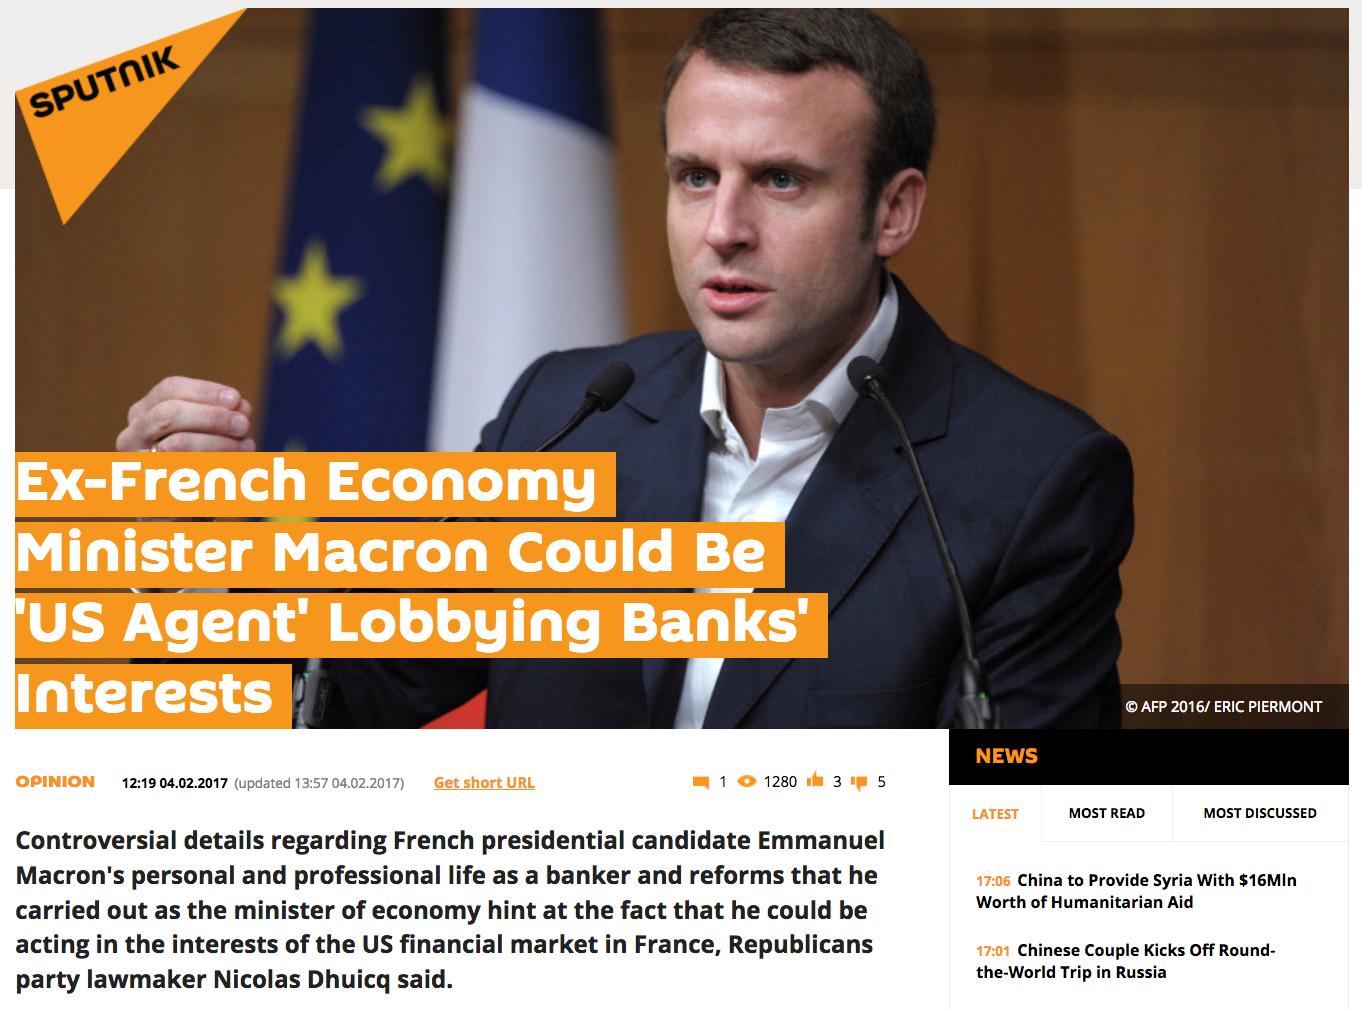 macron-wikileaks-agent-americain-lobby-banks